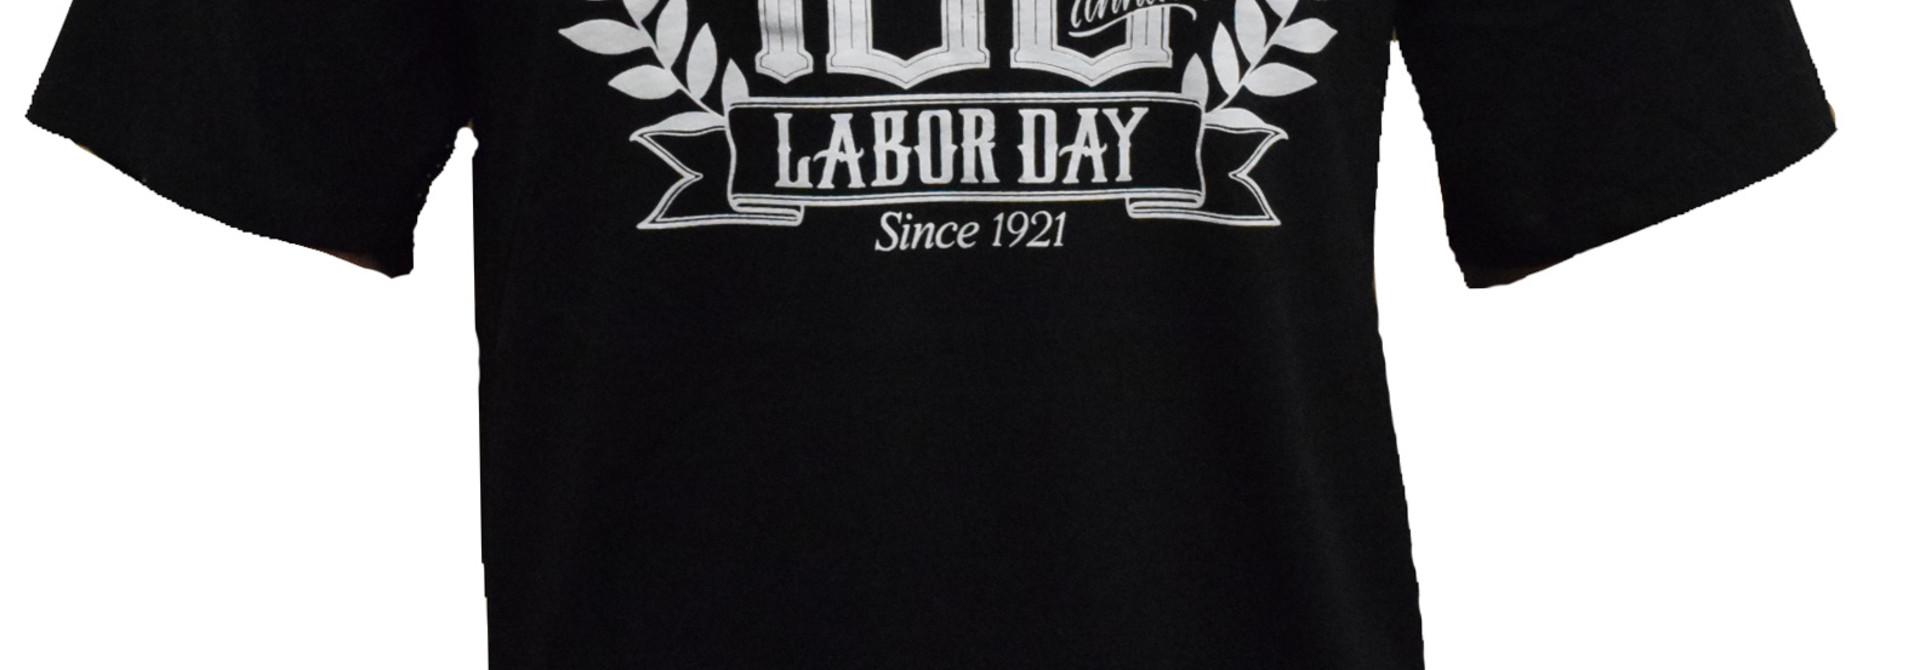 100th Annual Labor Day T-Shirt